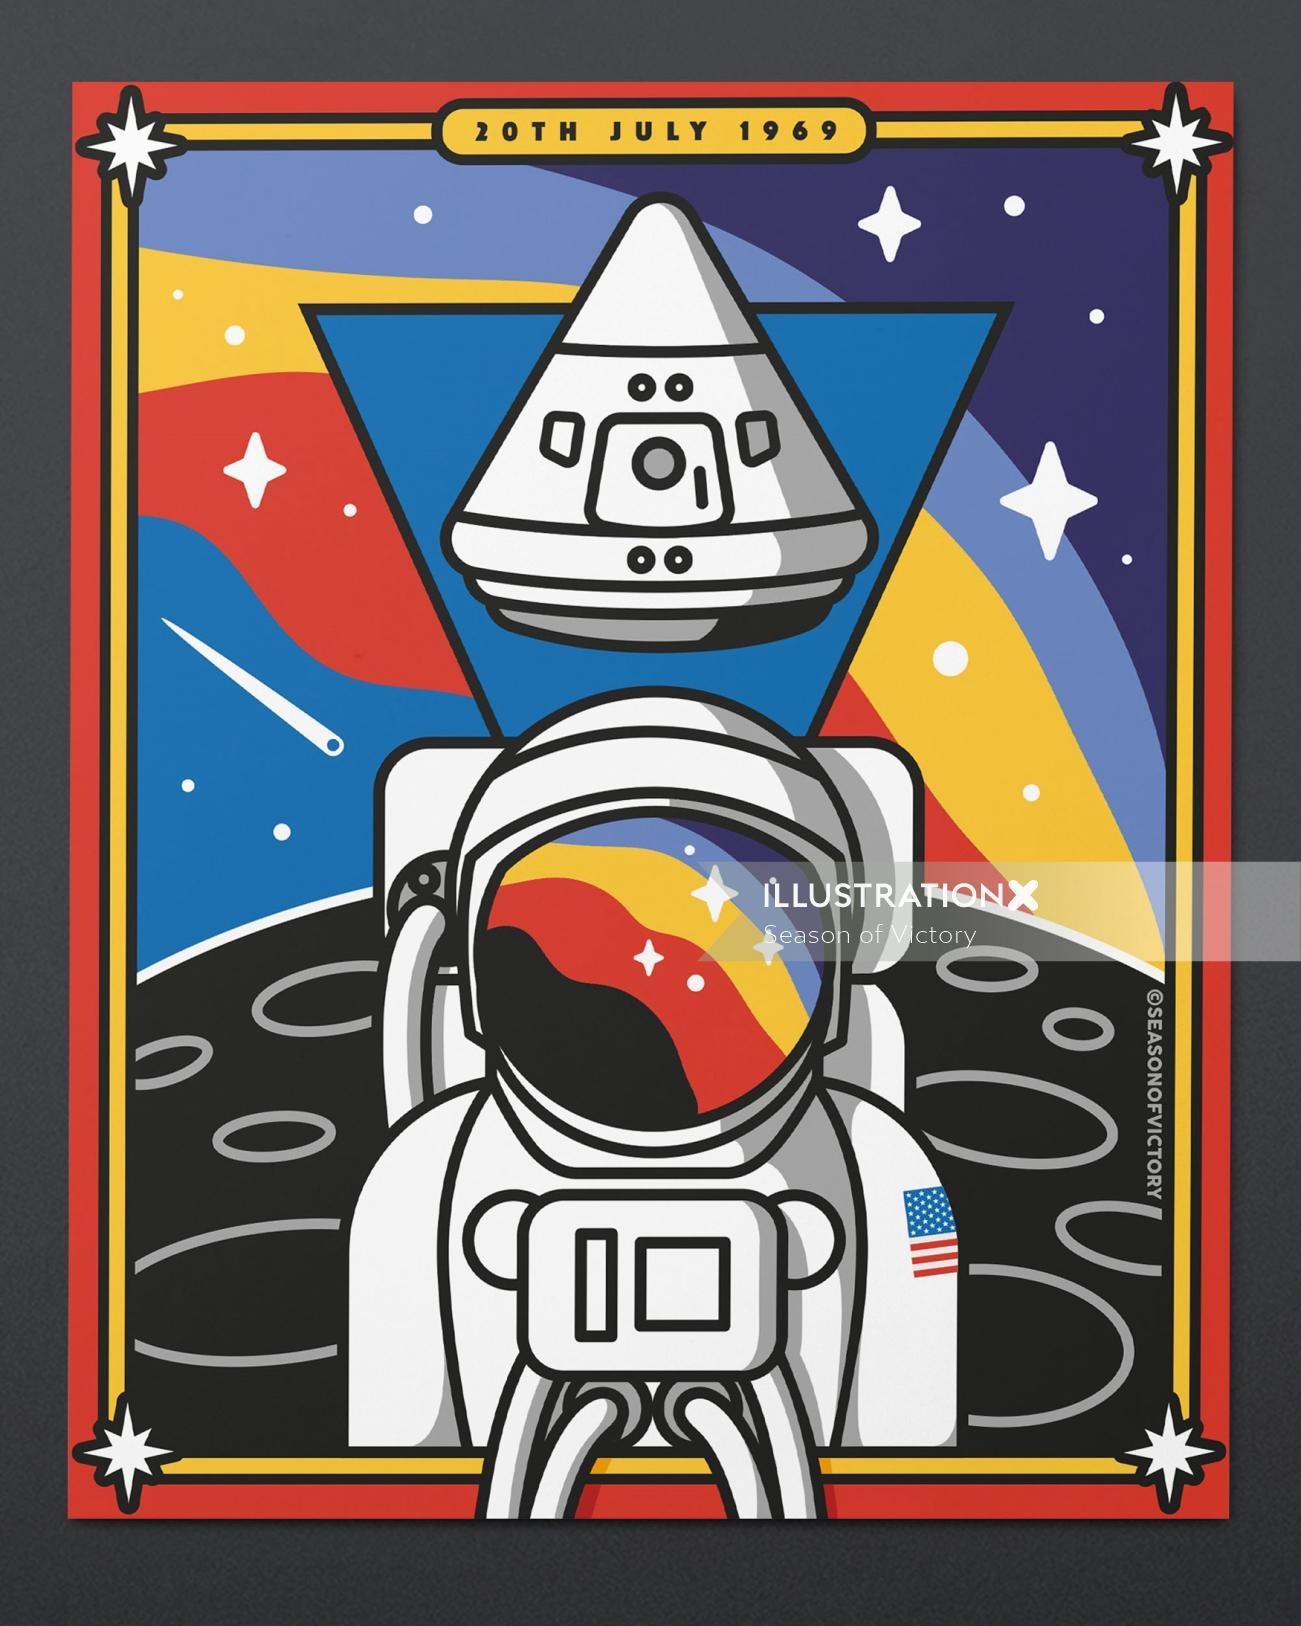 50th Anniversary of the Apollo 11 moon landing.